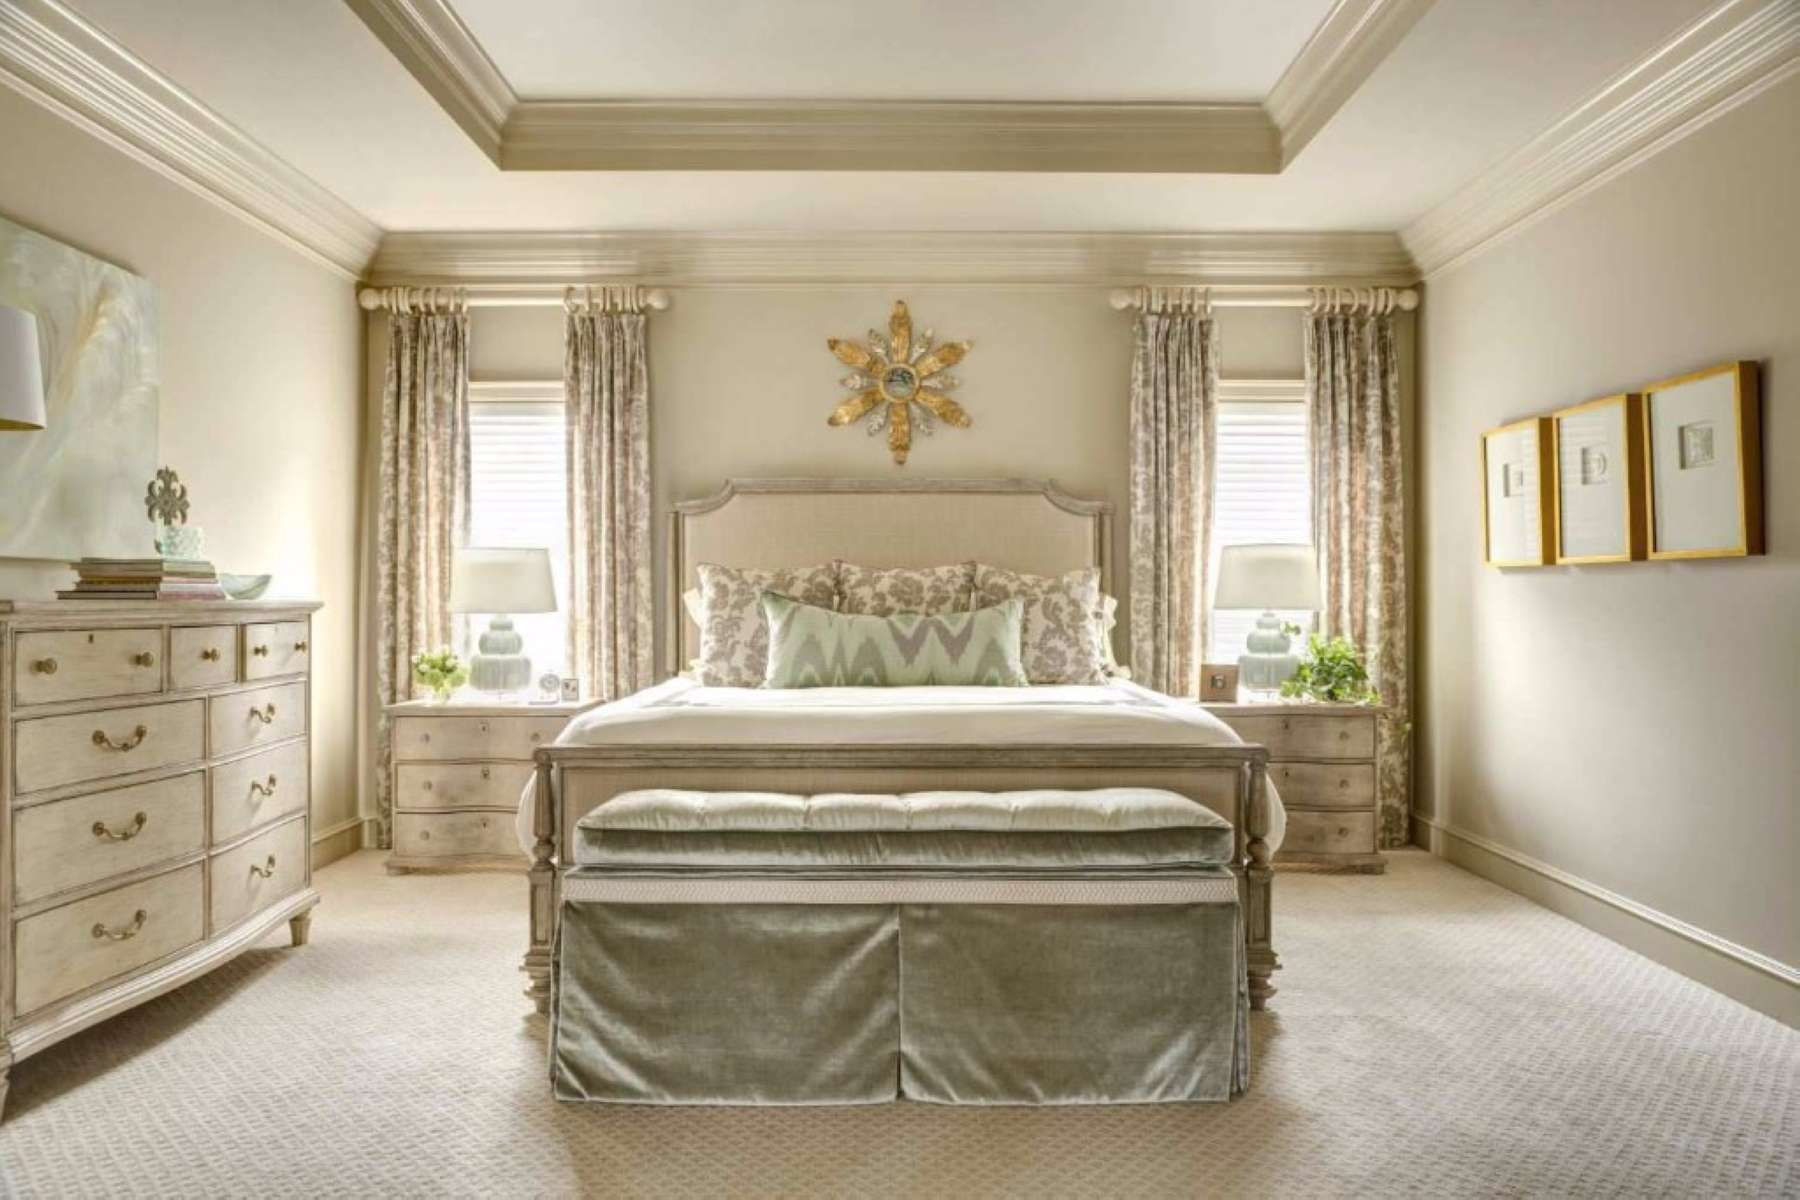 Arkansas-interior-design-Livable-Luxury-IMG_005